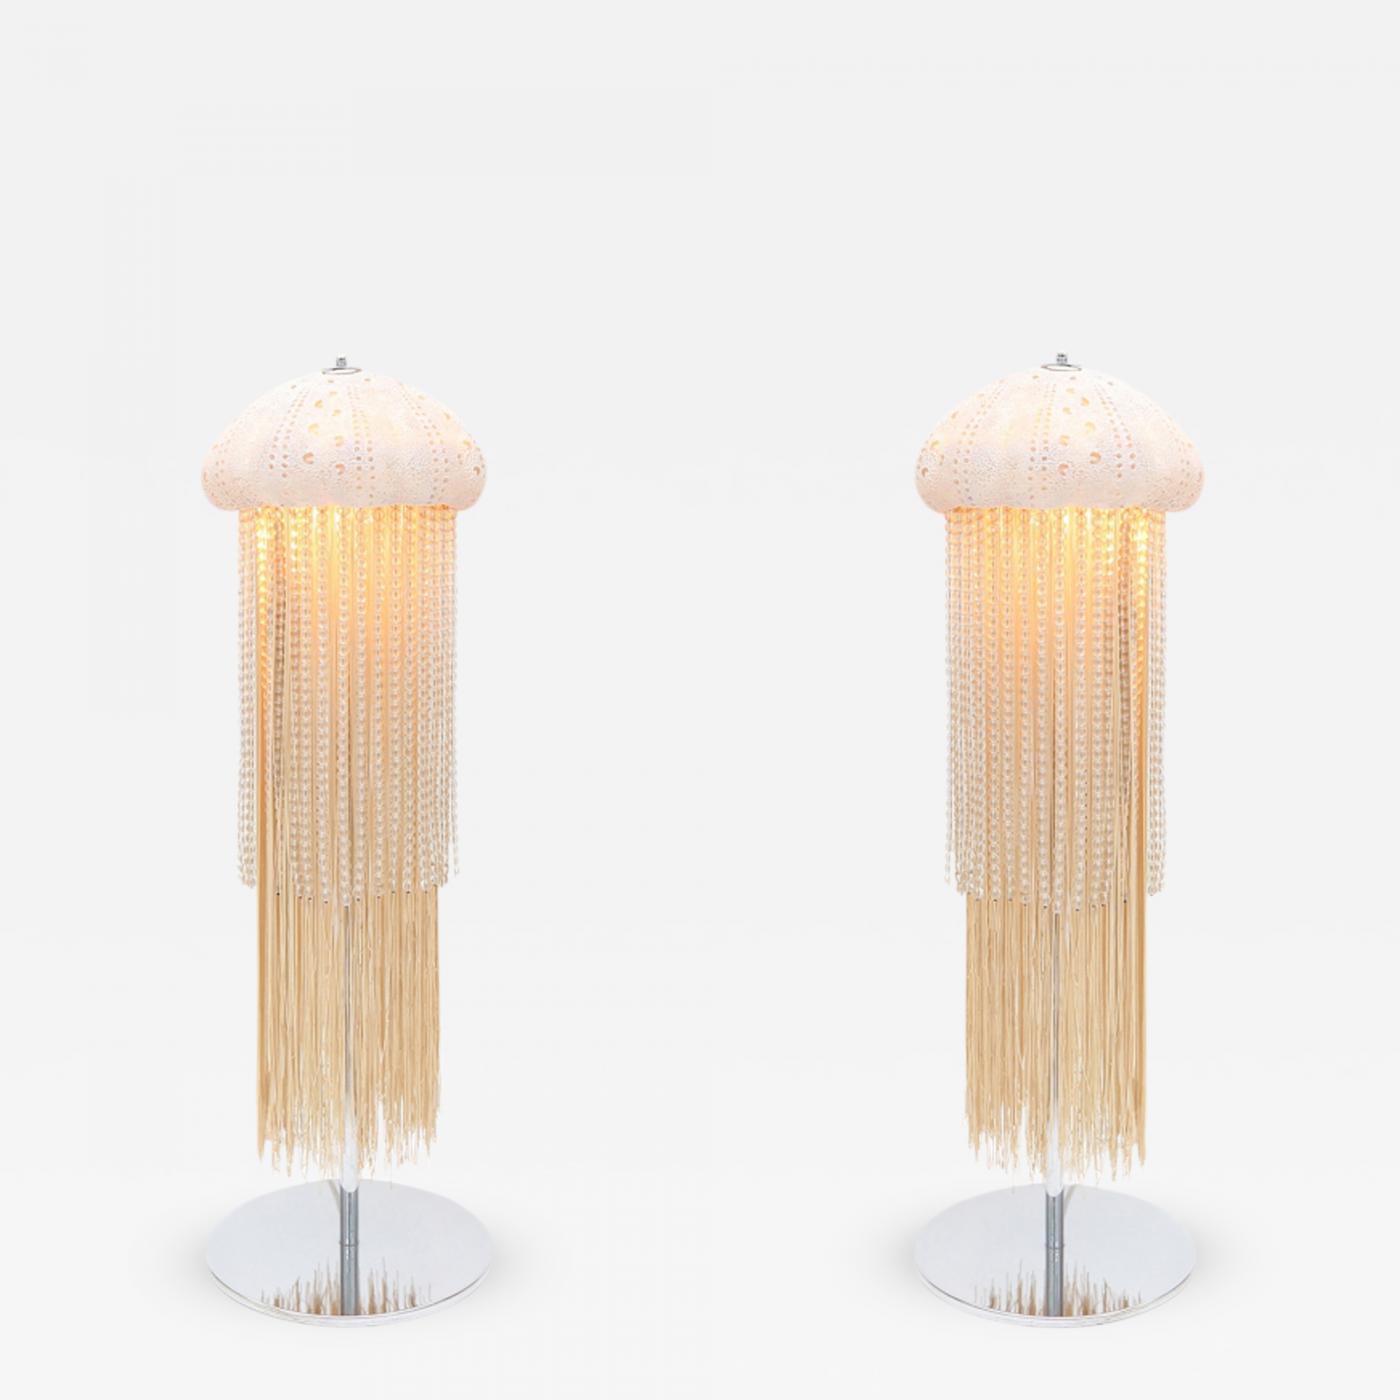 Jacques Garcia - Jacques Garcia Jellyfish Floor Lamp